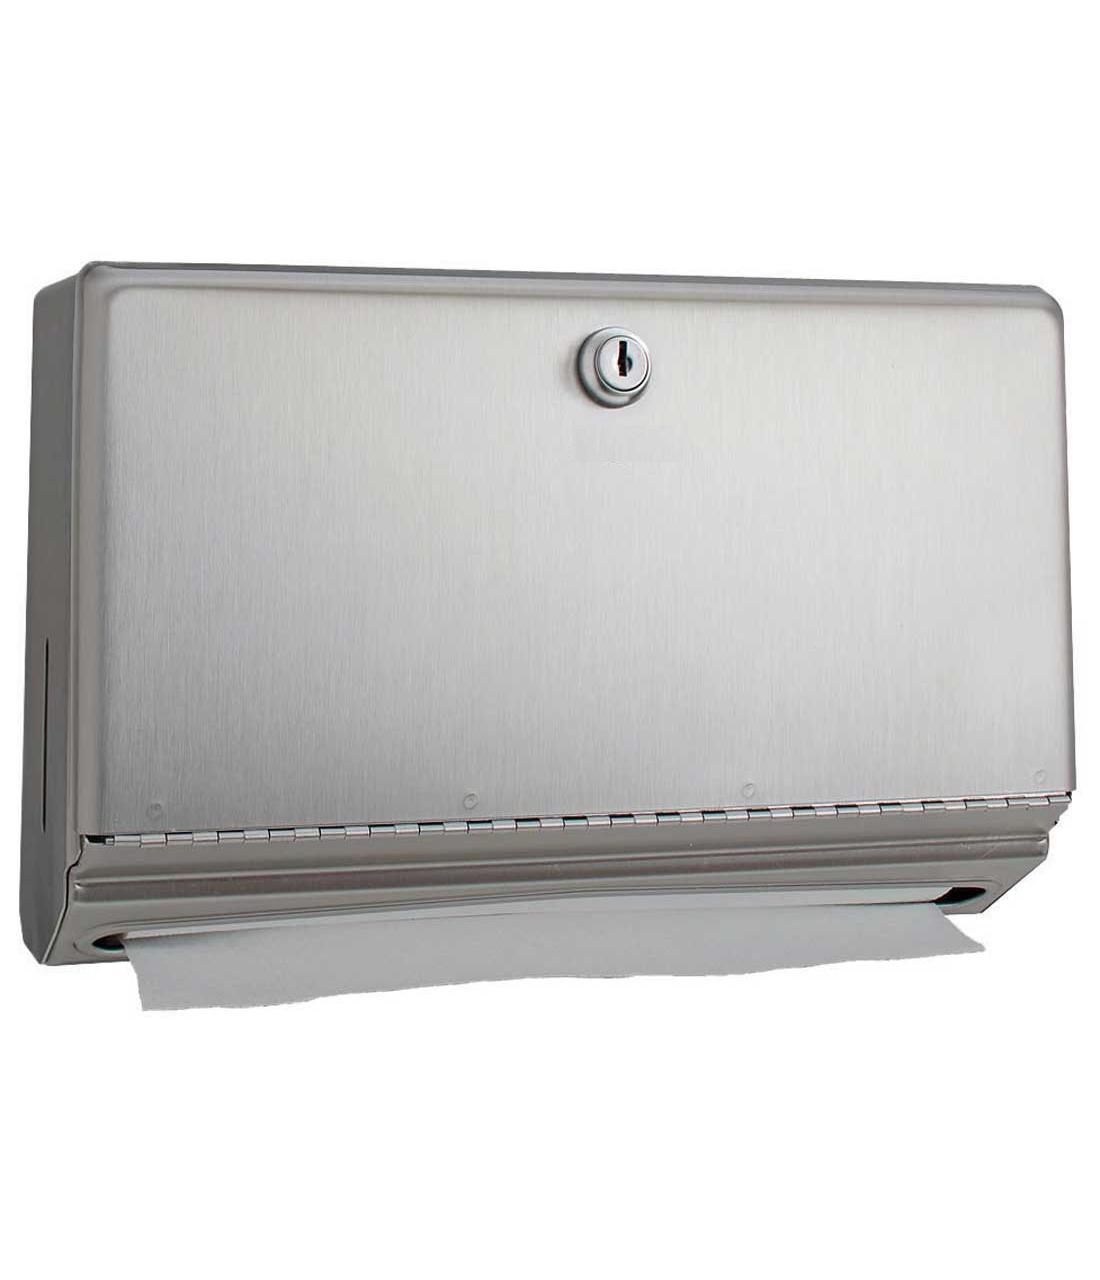 Gamco TD-2-8 Surface Mounted Paper Towel Dispenser